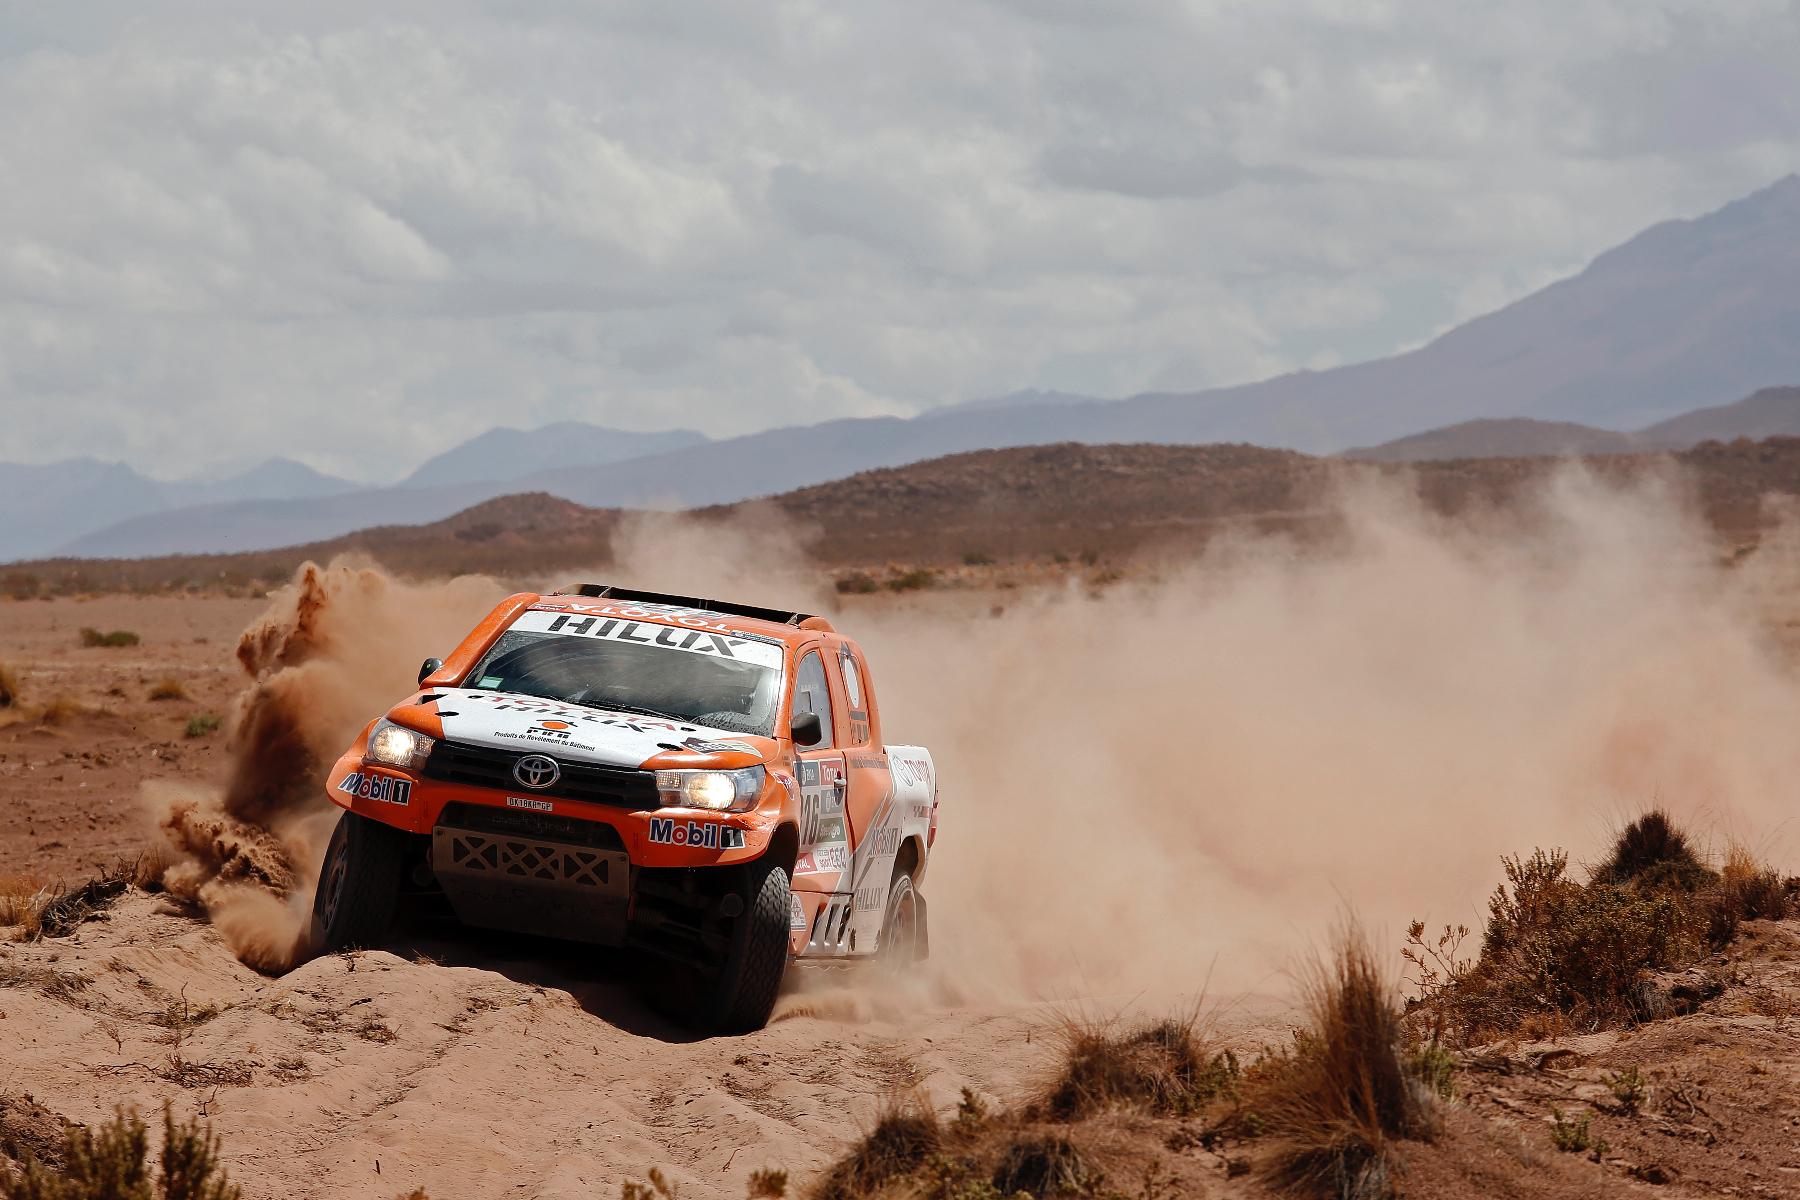 316 CHABOT Ronan (fra) PILLOT Gilles (fra) TOYOTA action during the Dakar 2016 Argentina,  Bolivia, Etape 6 - Stage 6, Uyuni - Uyuni,  from  January 8, 2016 - Photo Florent Gooden / DPPI